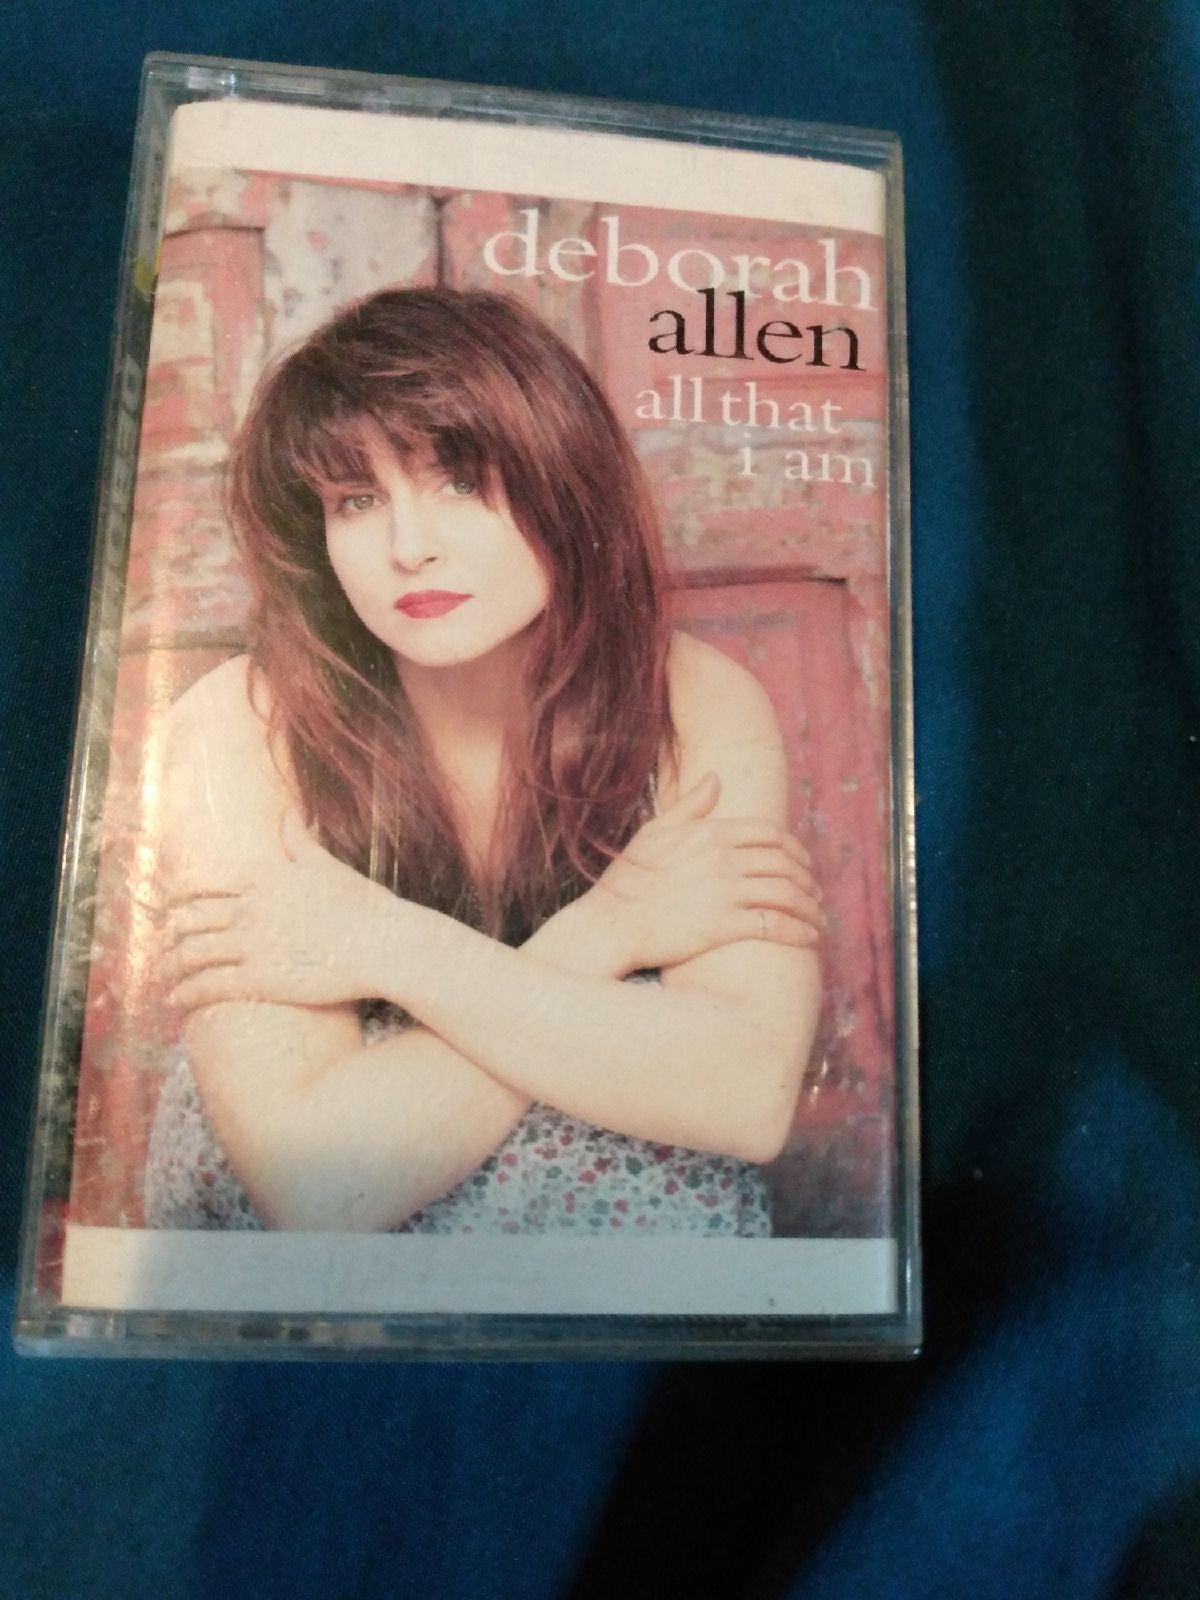 Deborah Allen cassette tape